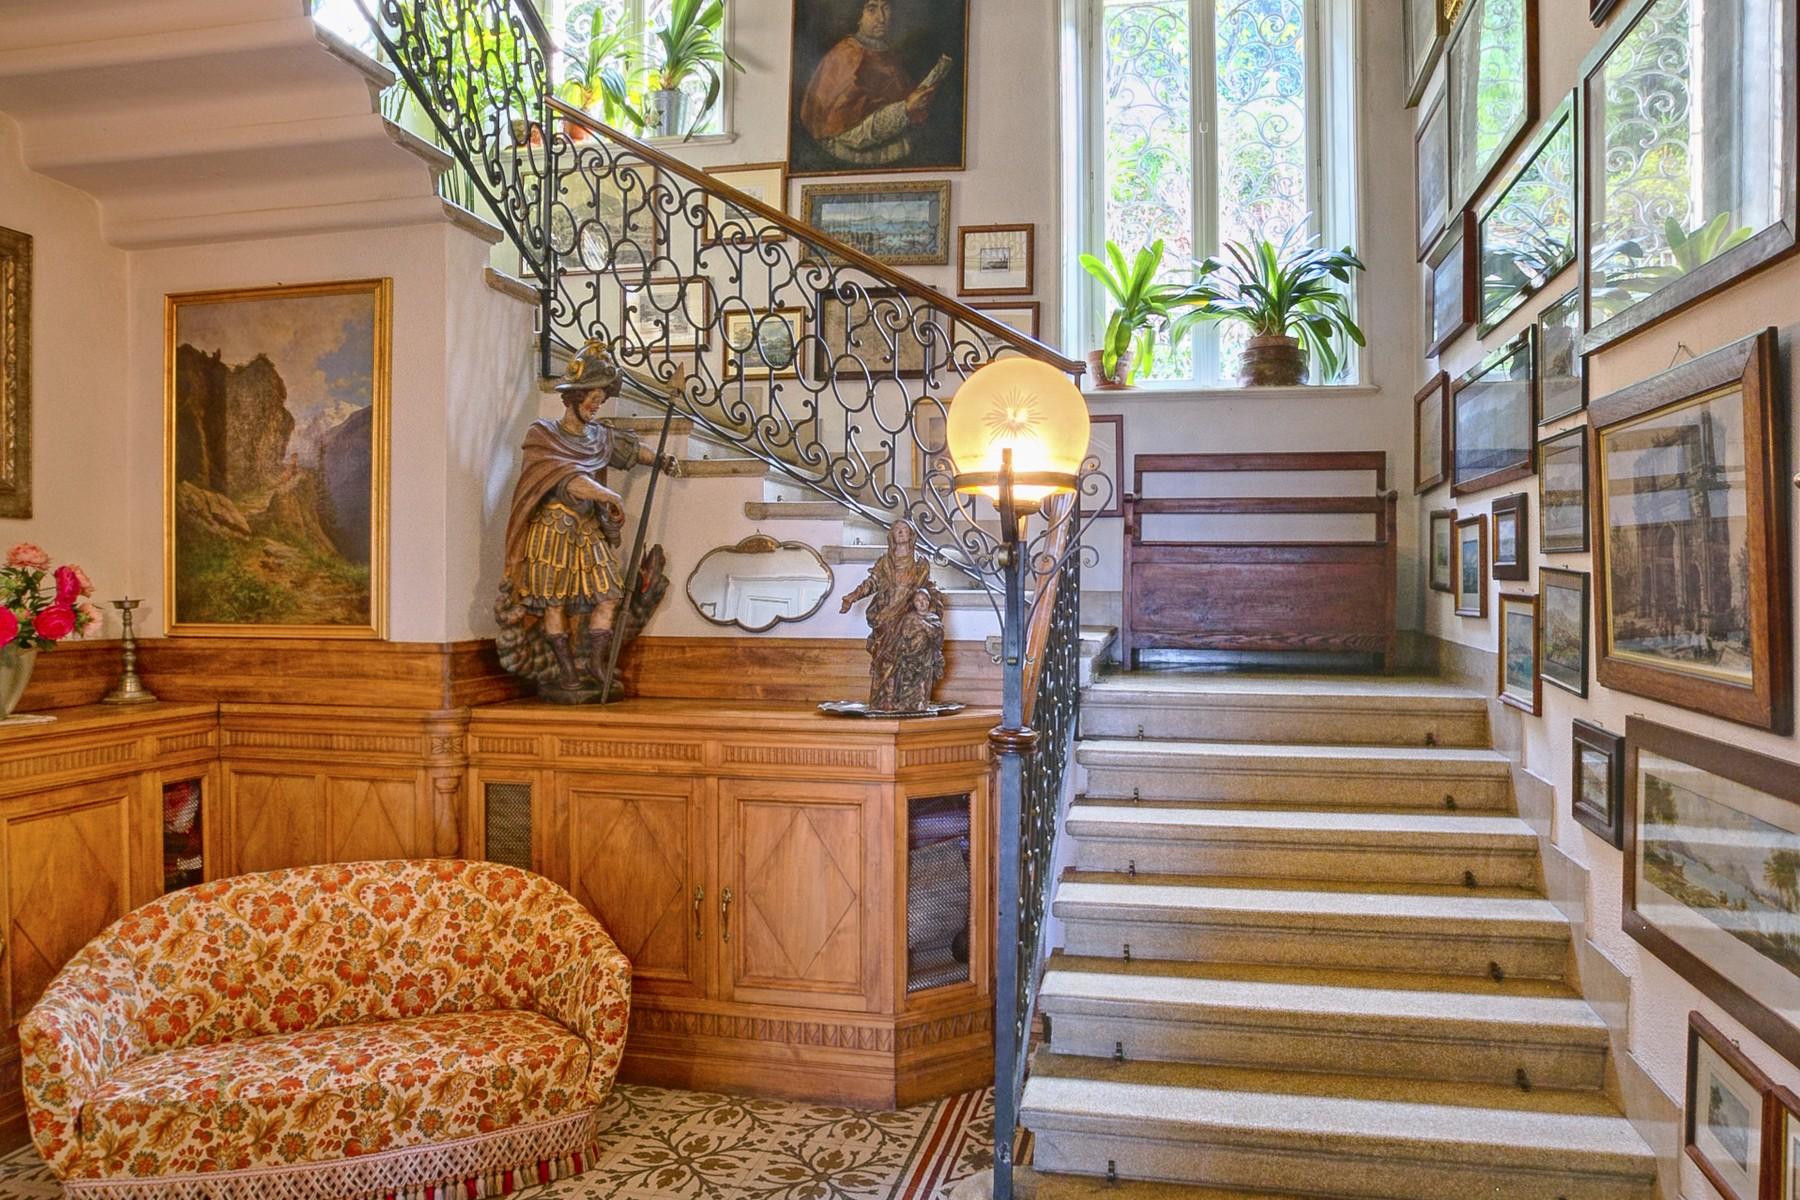 Villa in Vendita a Stresa: 5 locali, 800 mq - Foto 18